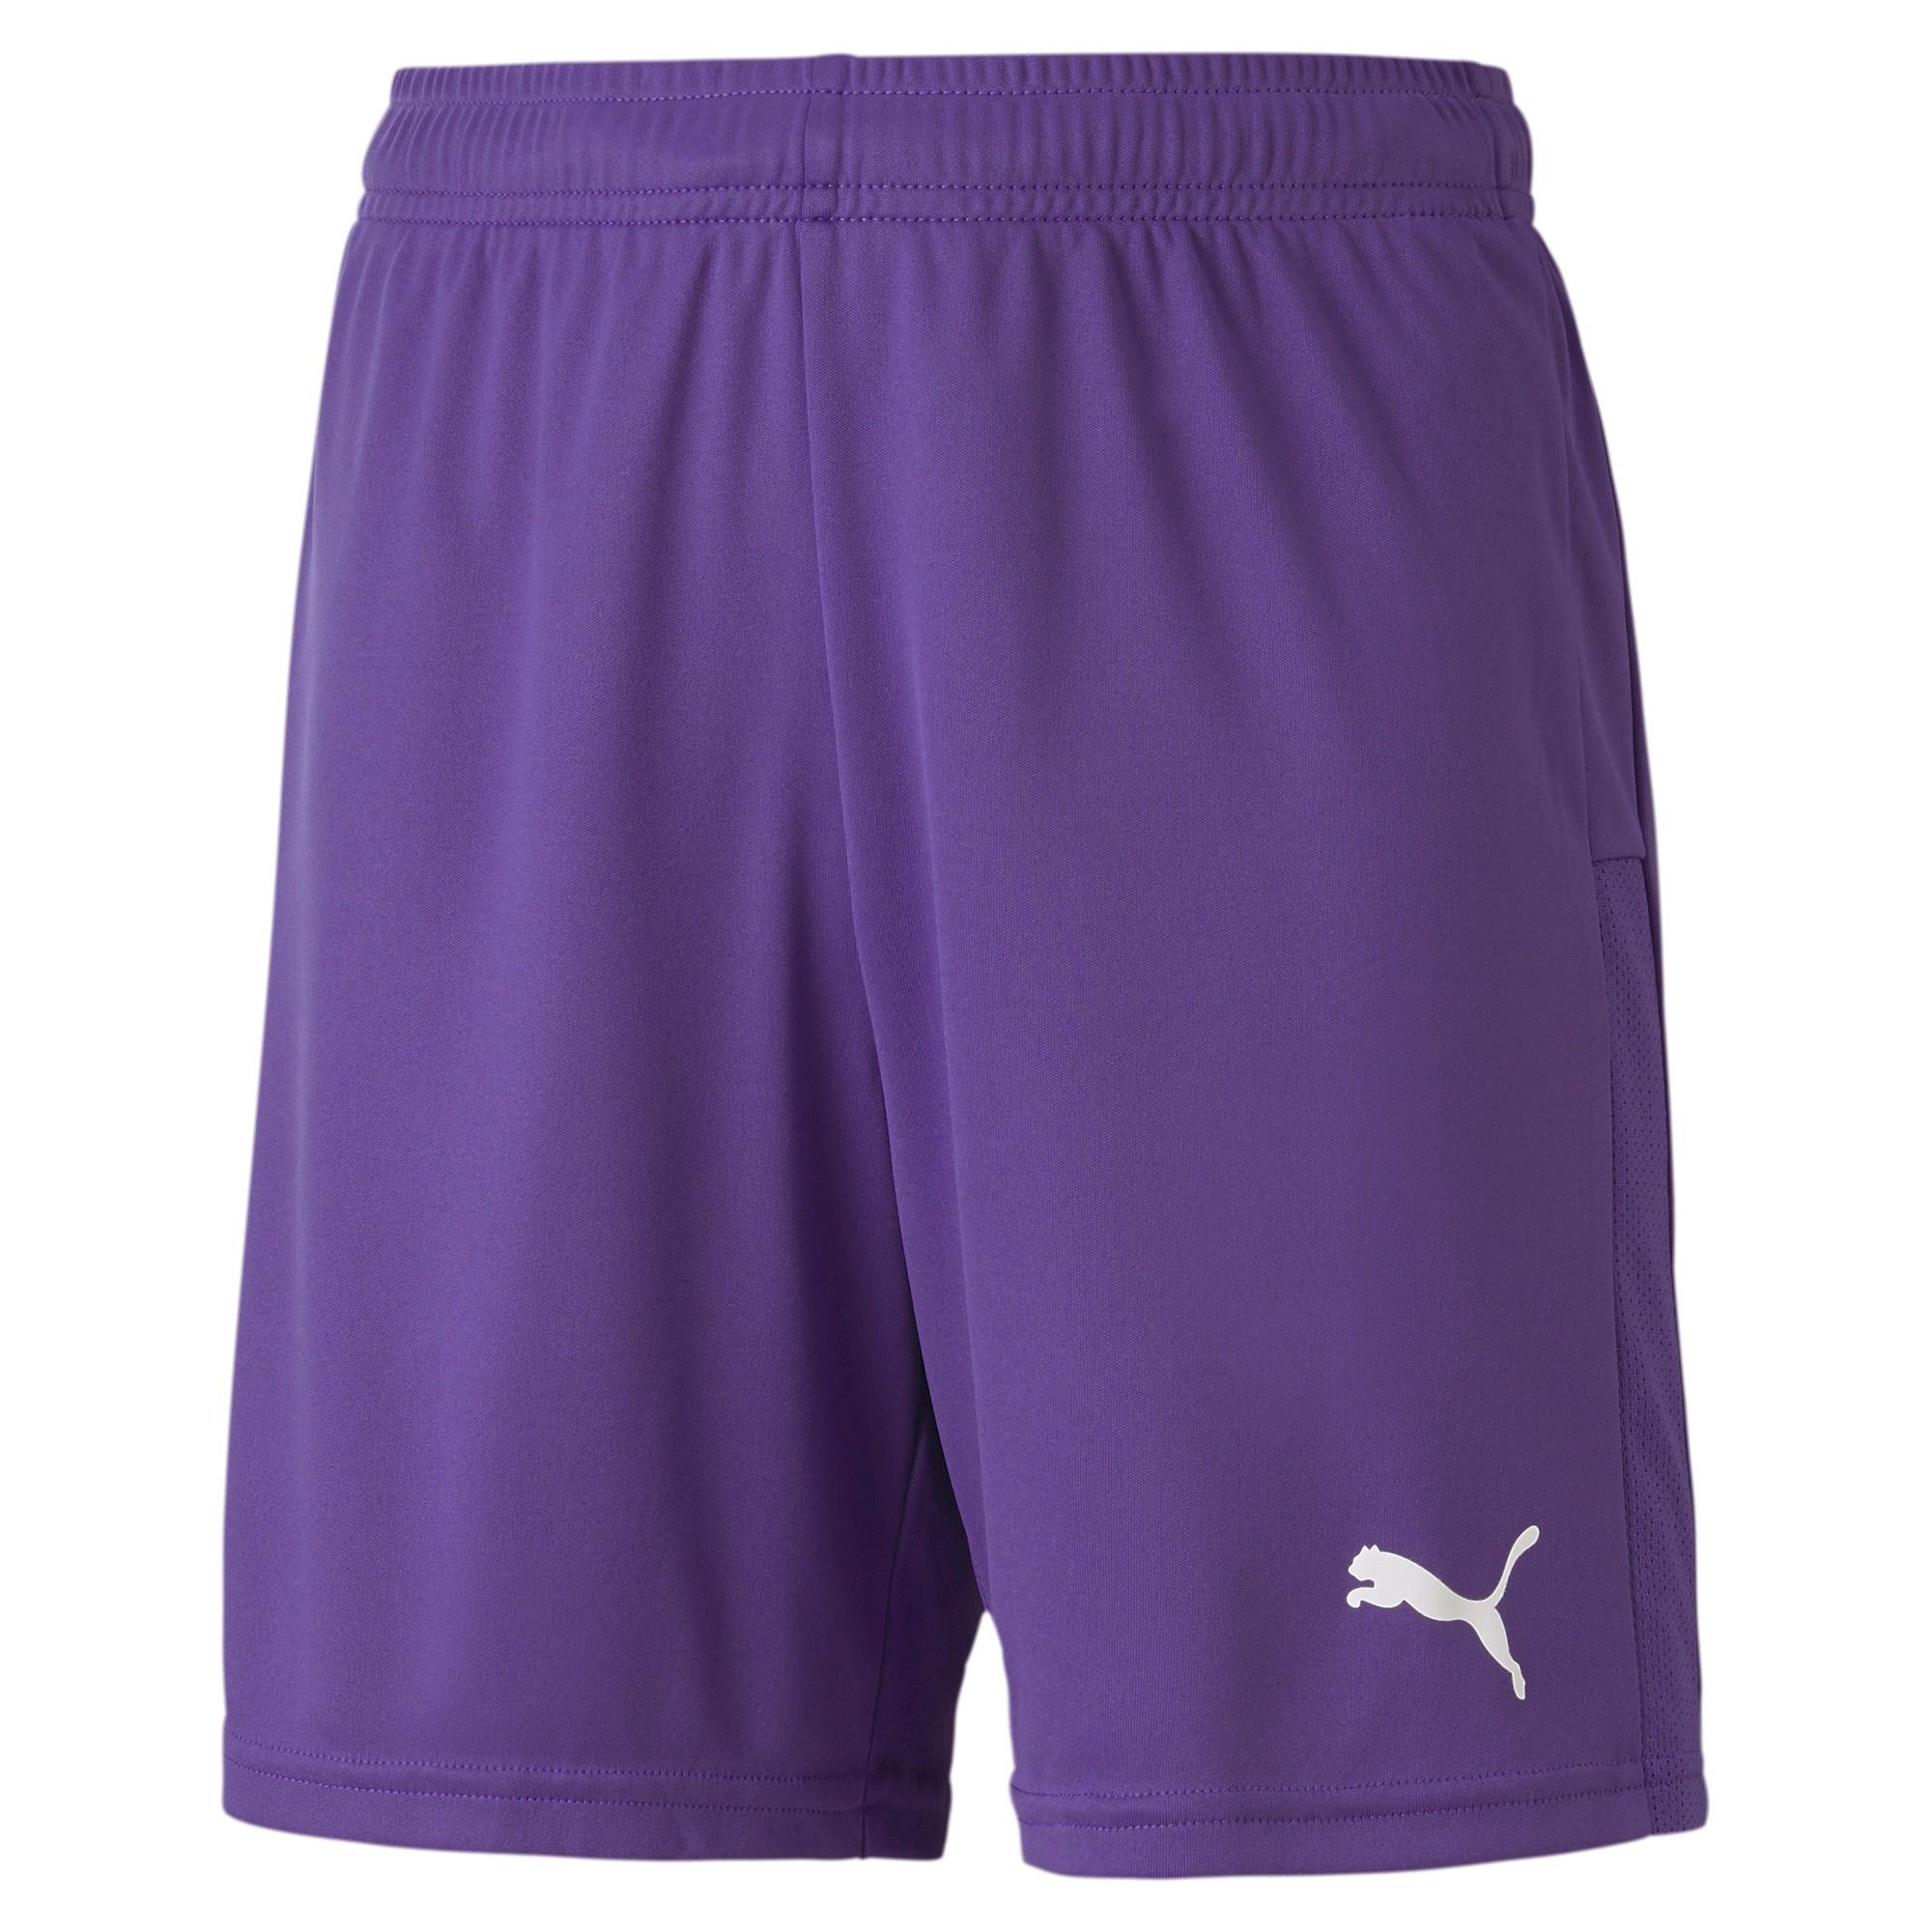 Fuchsia Bright Knit Shorts